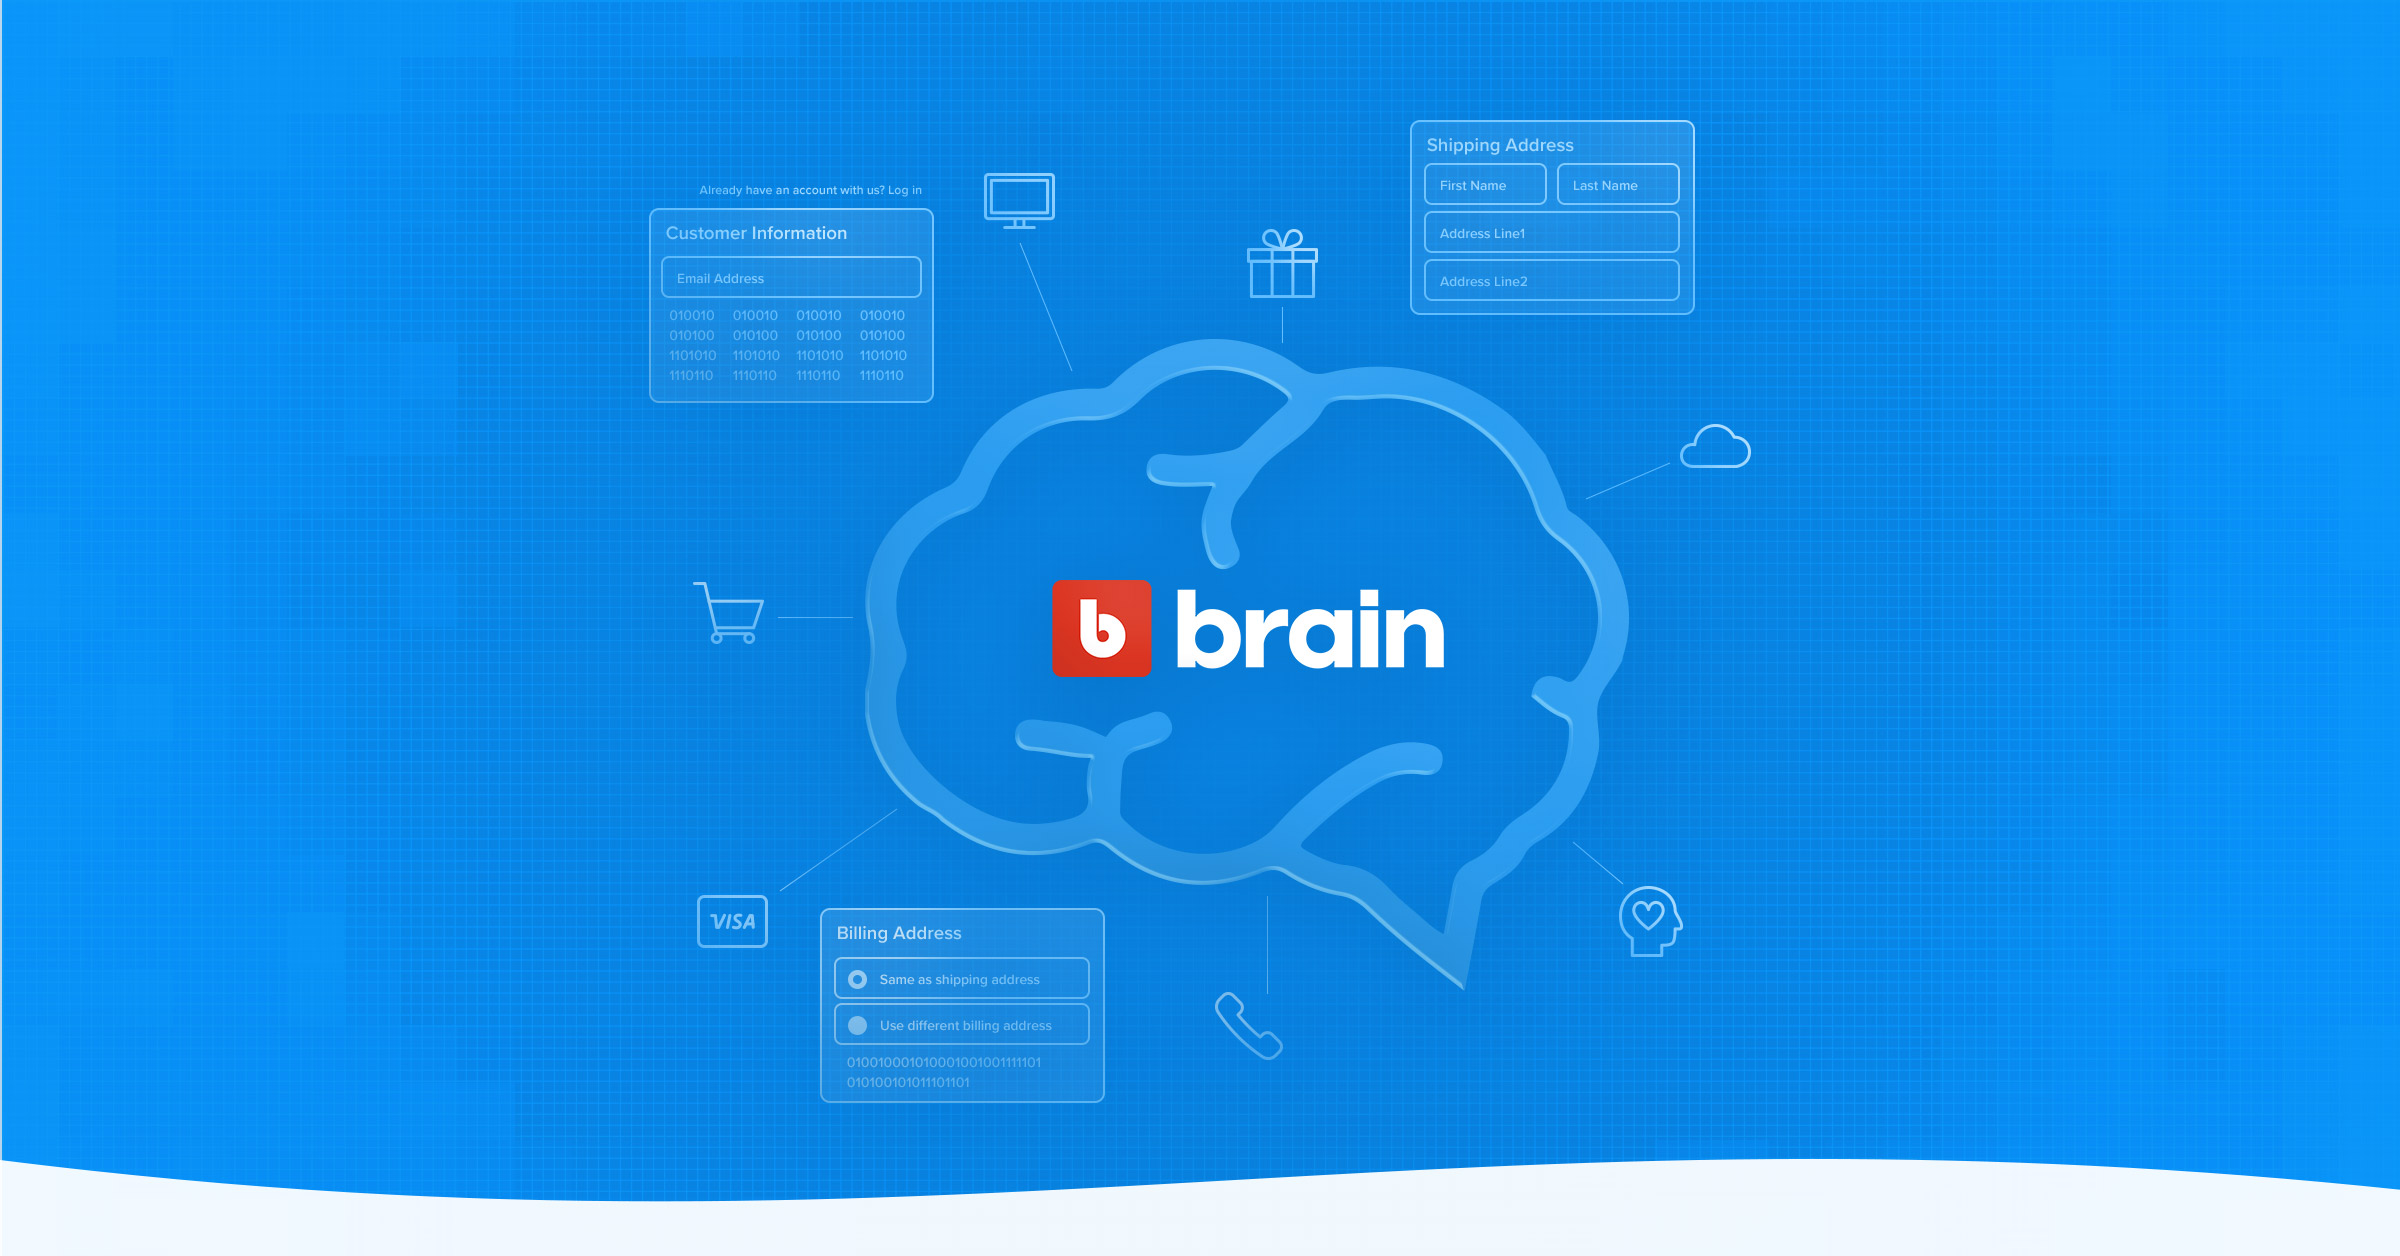 brain-2019